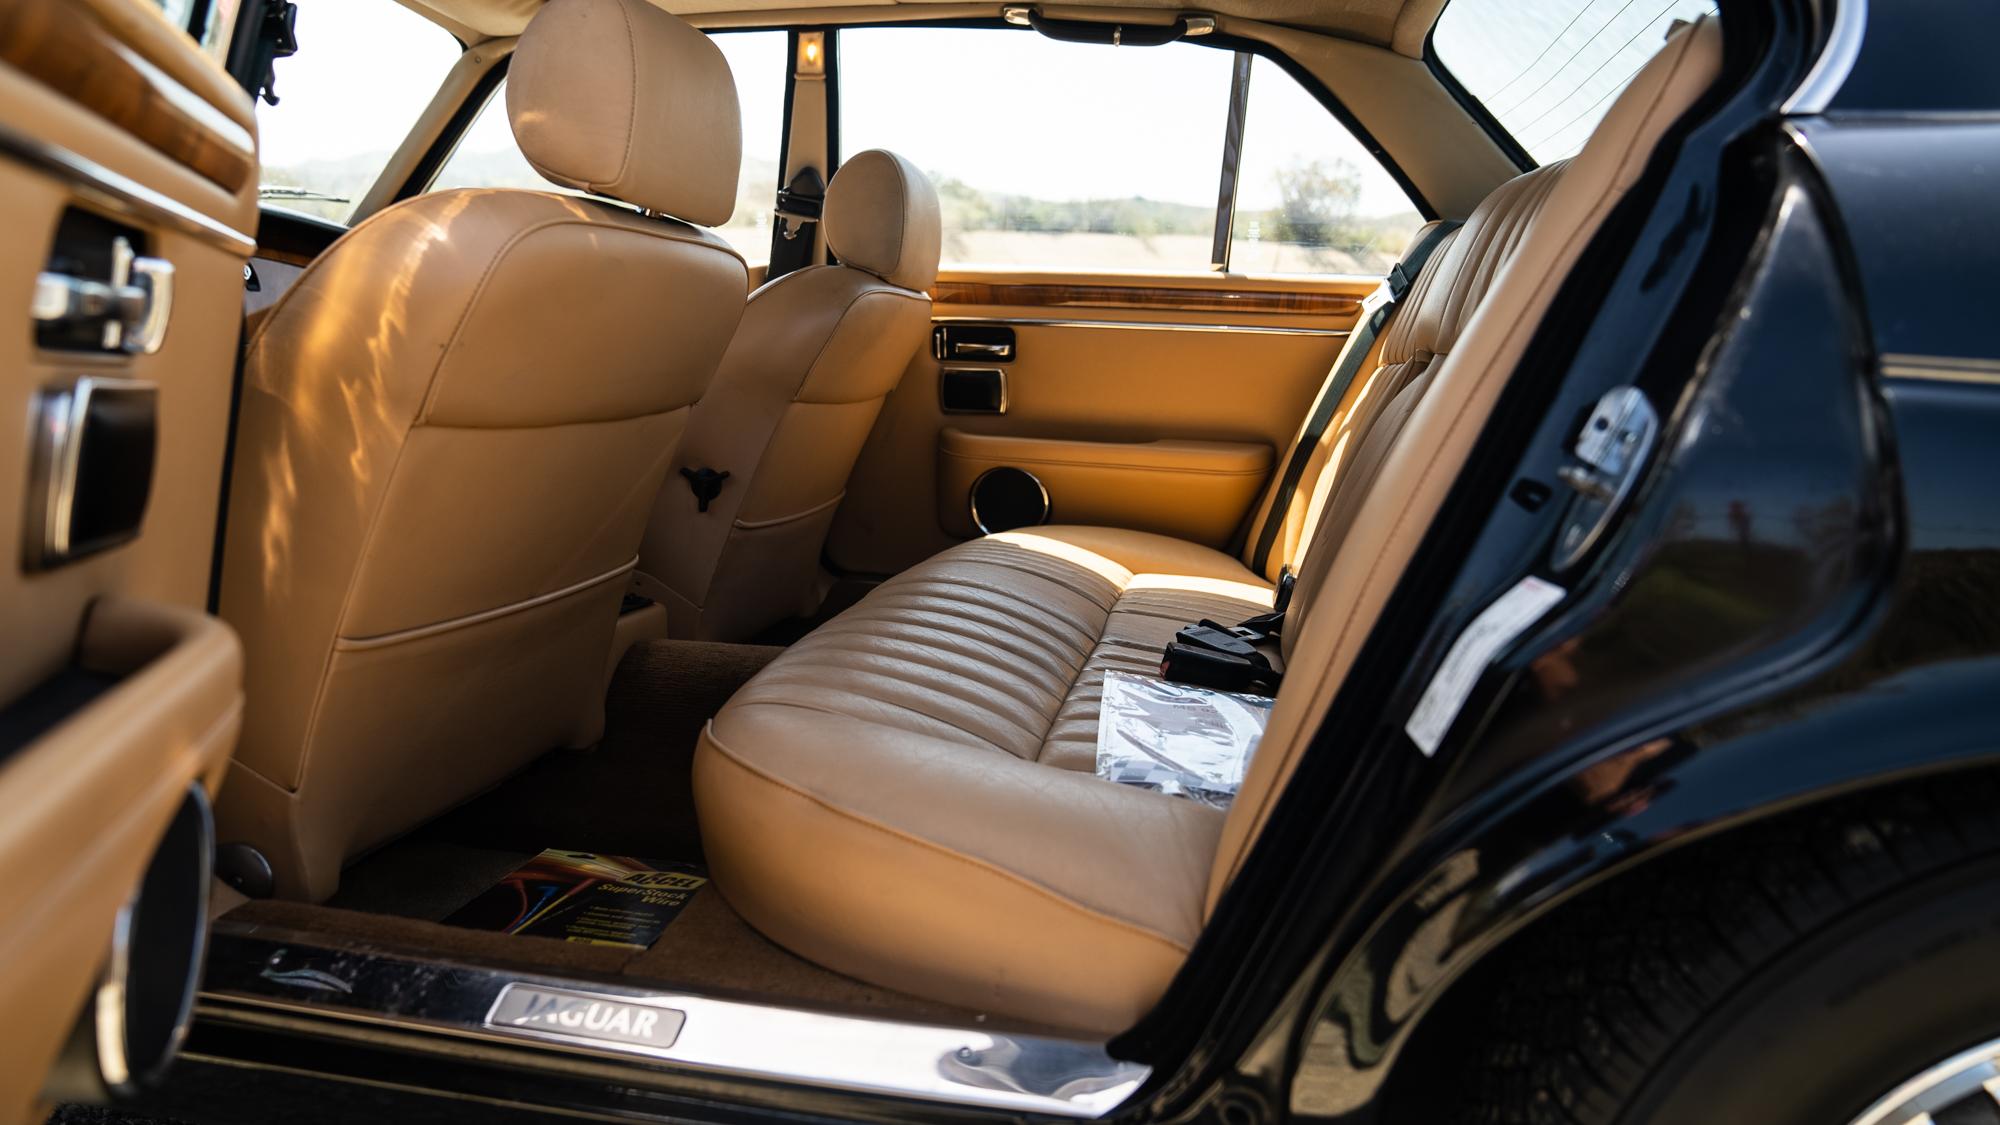 1986 Jaguar XJ6 back seat